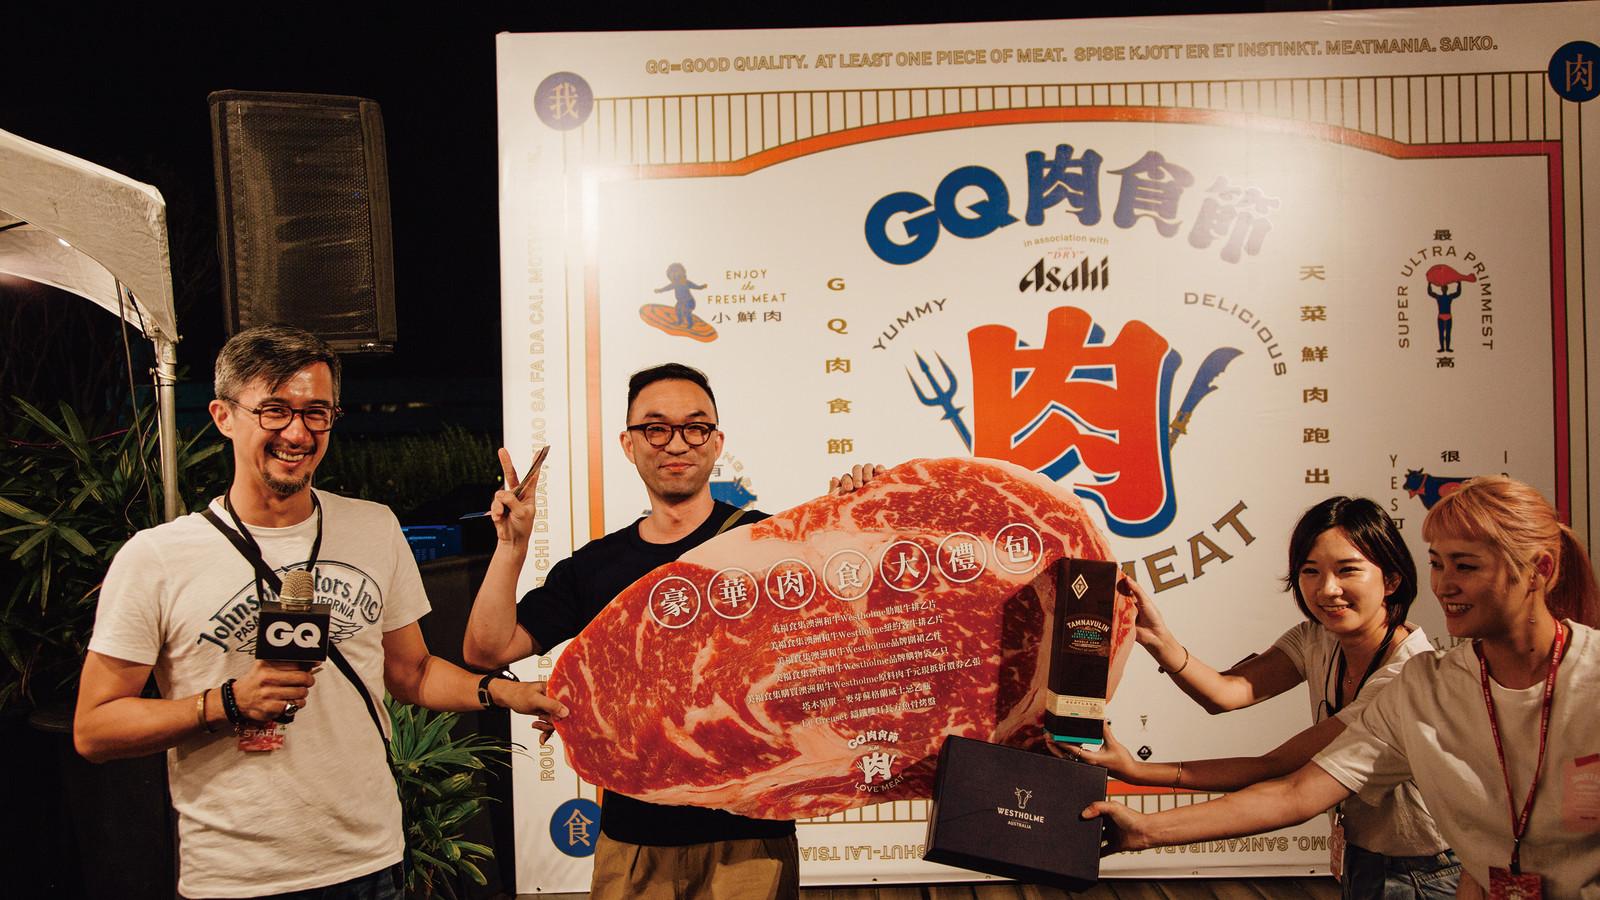 David meat - giles.heasman(何家樂) - Taiwan - GQ Meat Festival